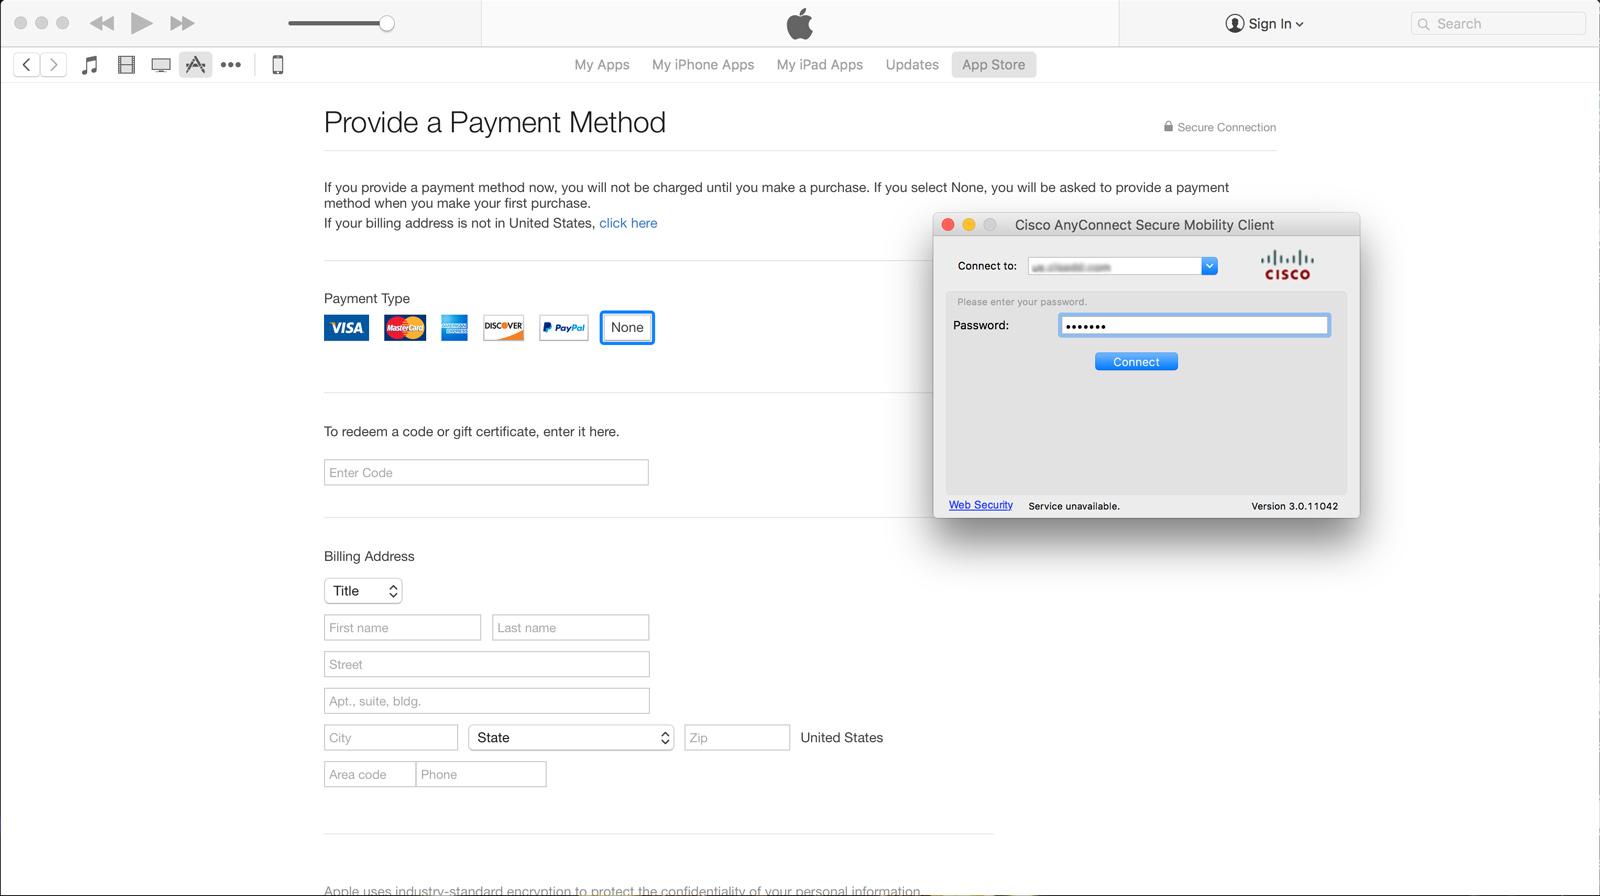 Apple ID 08 خرید اپل آیدی,خرید اپل آیدی ارزان,خرید اپل آیدی آماده